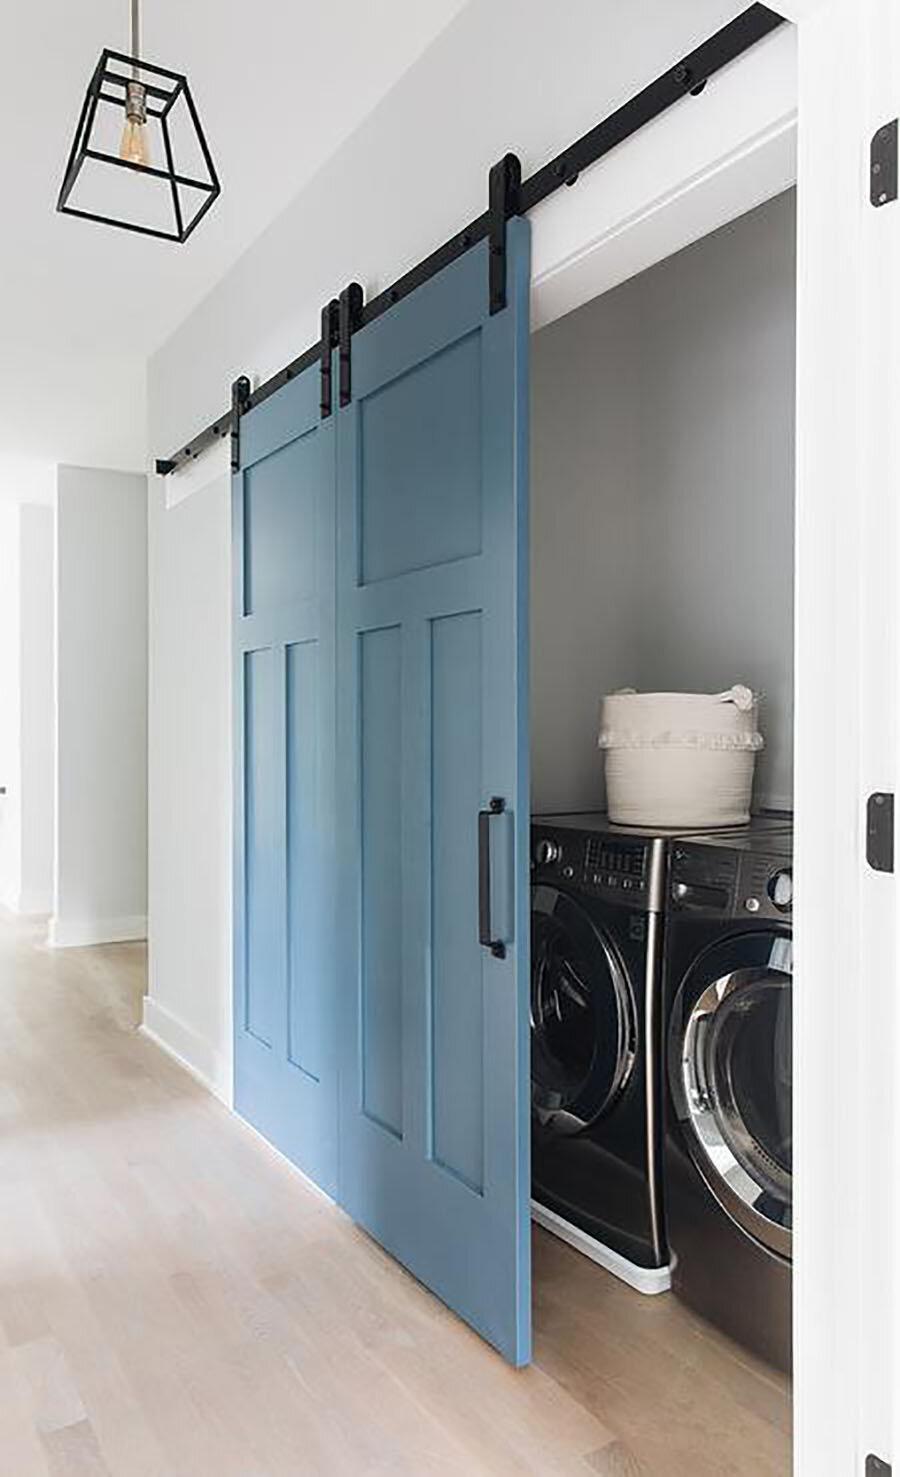 hallway-closet-laundry-room-with-barn-door-on-rails.jpg